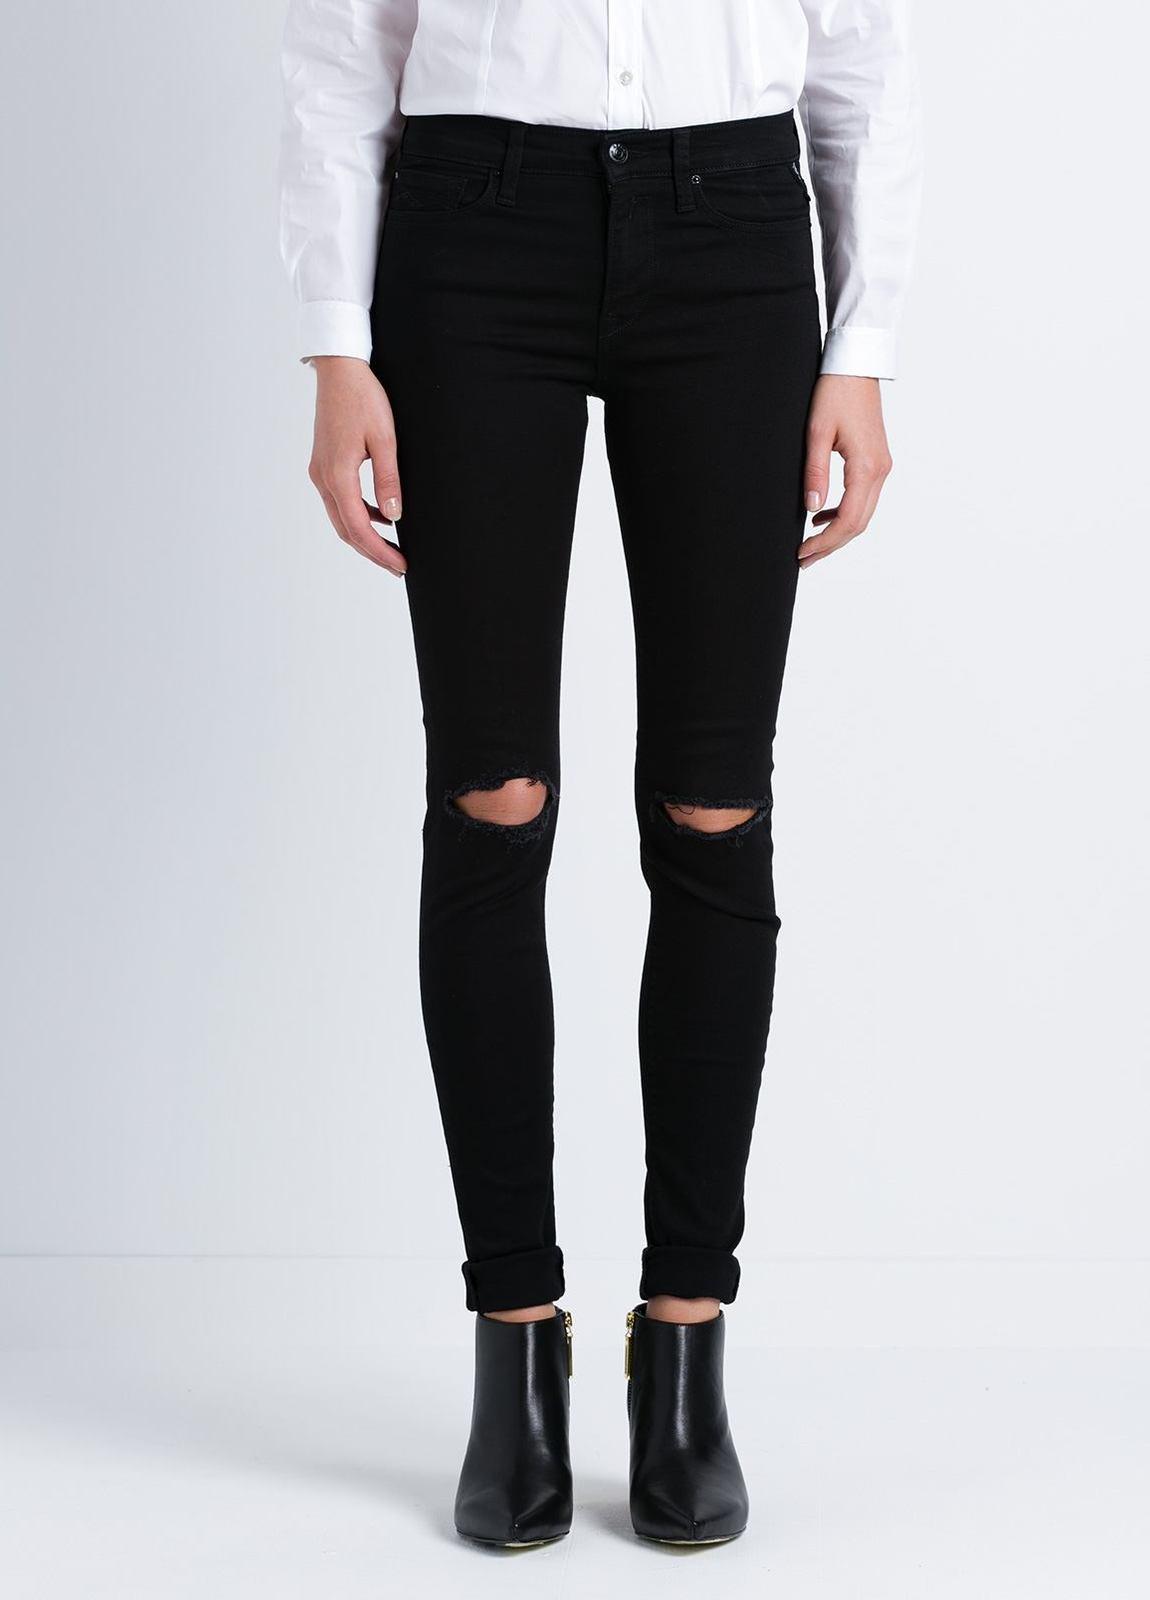 Tejano jegging modelo JOI con roturas en las rodillas color negro lavado denim. Algodón, Modal, Elastano.